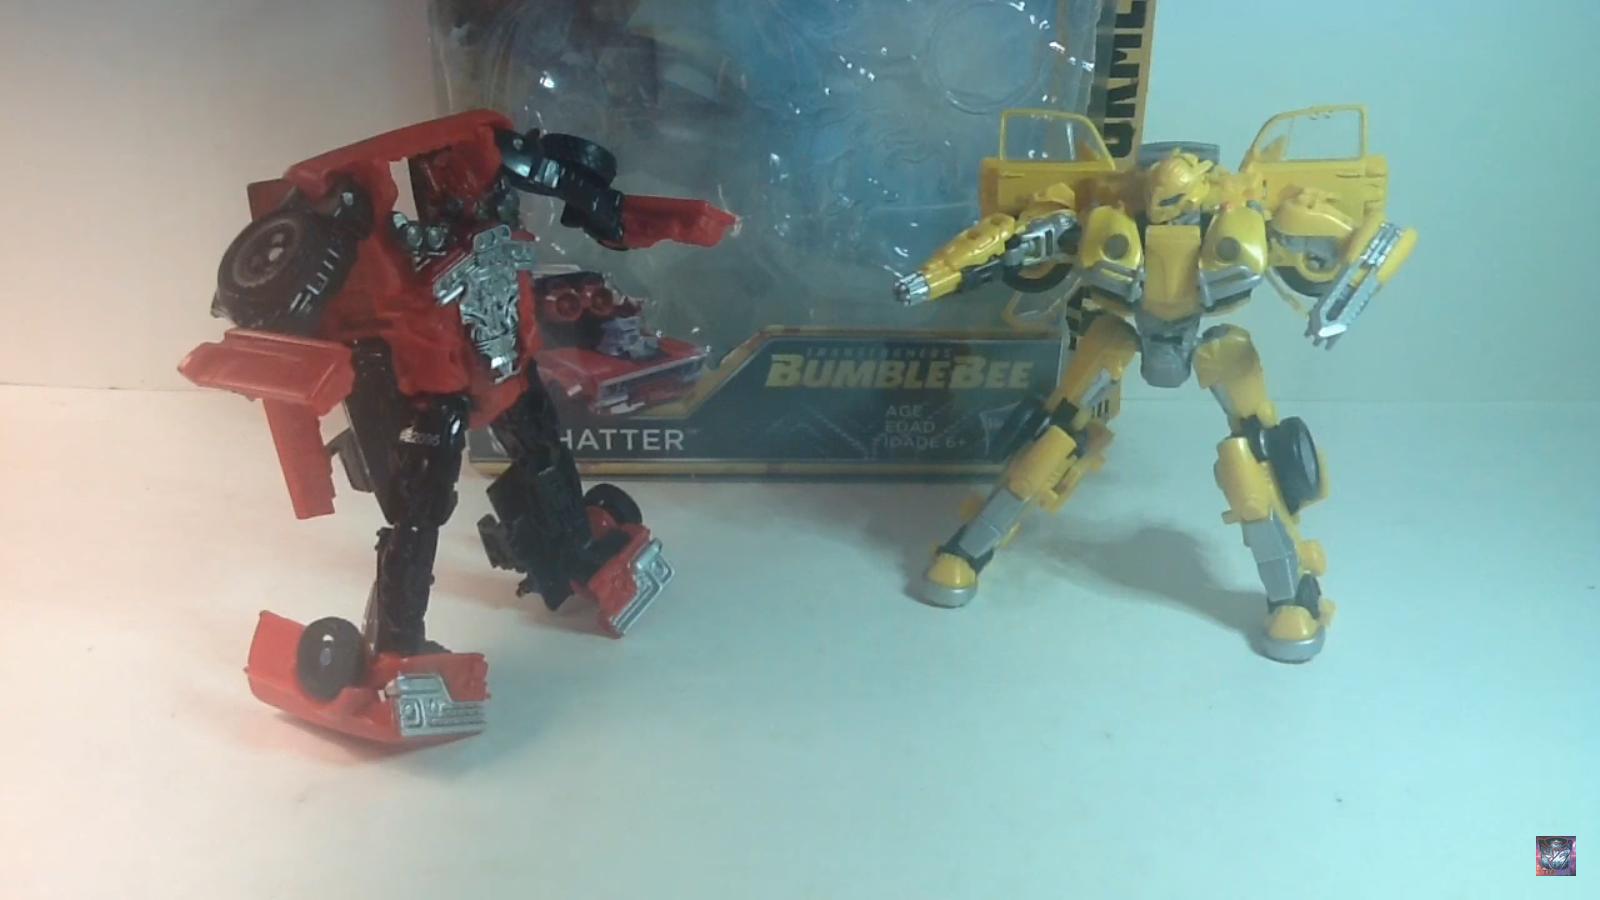 Transformers Bumblebee Movie Energon Igniters Power Series SHATTER *New* Hasbro